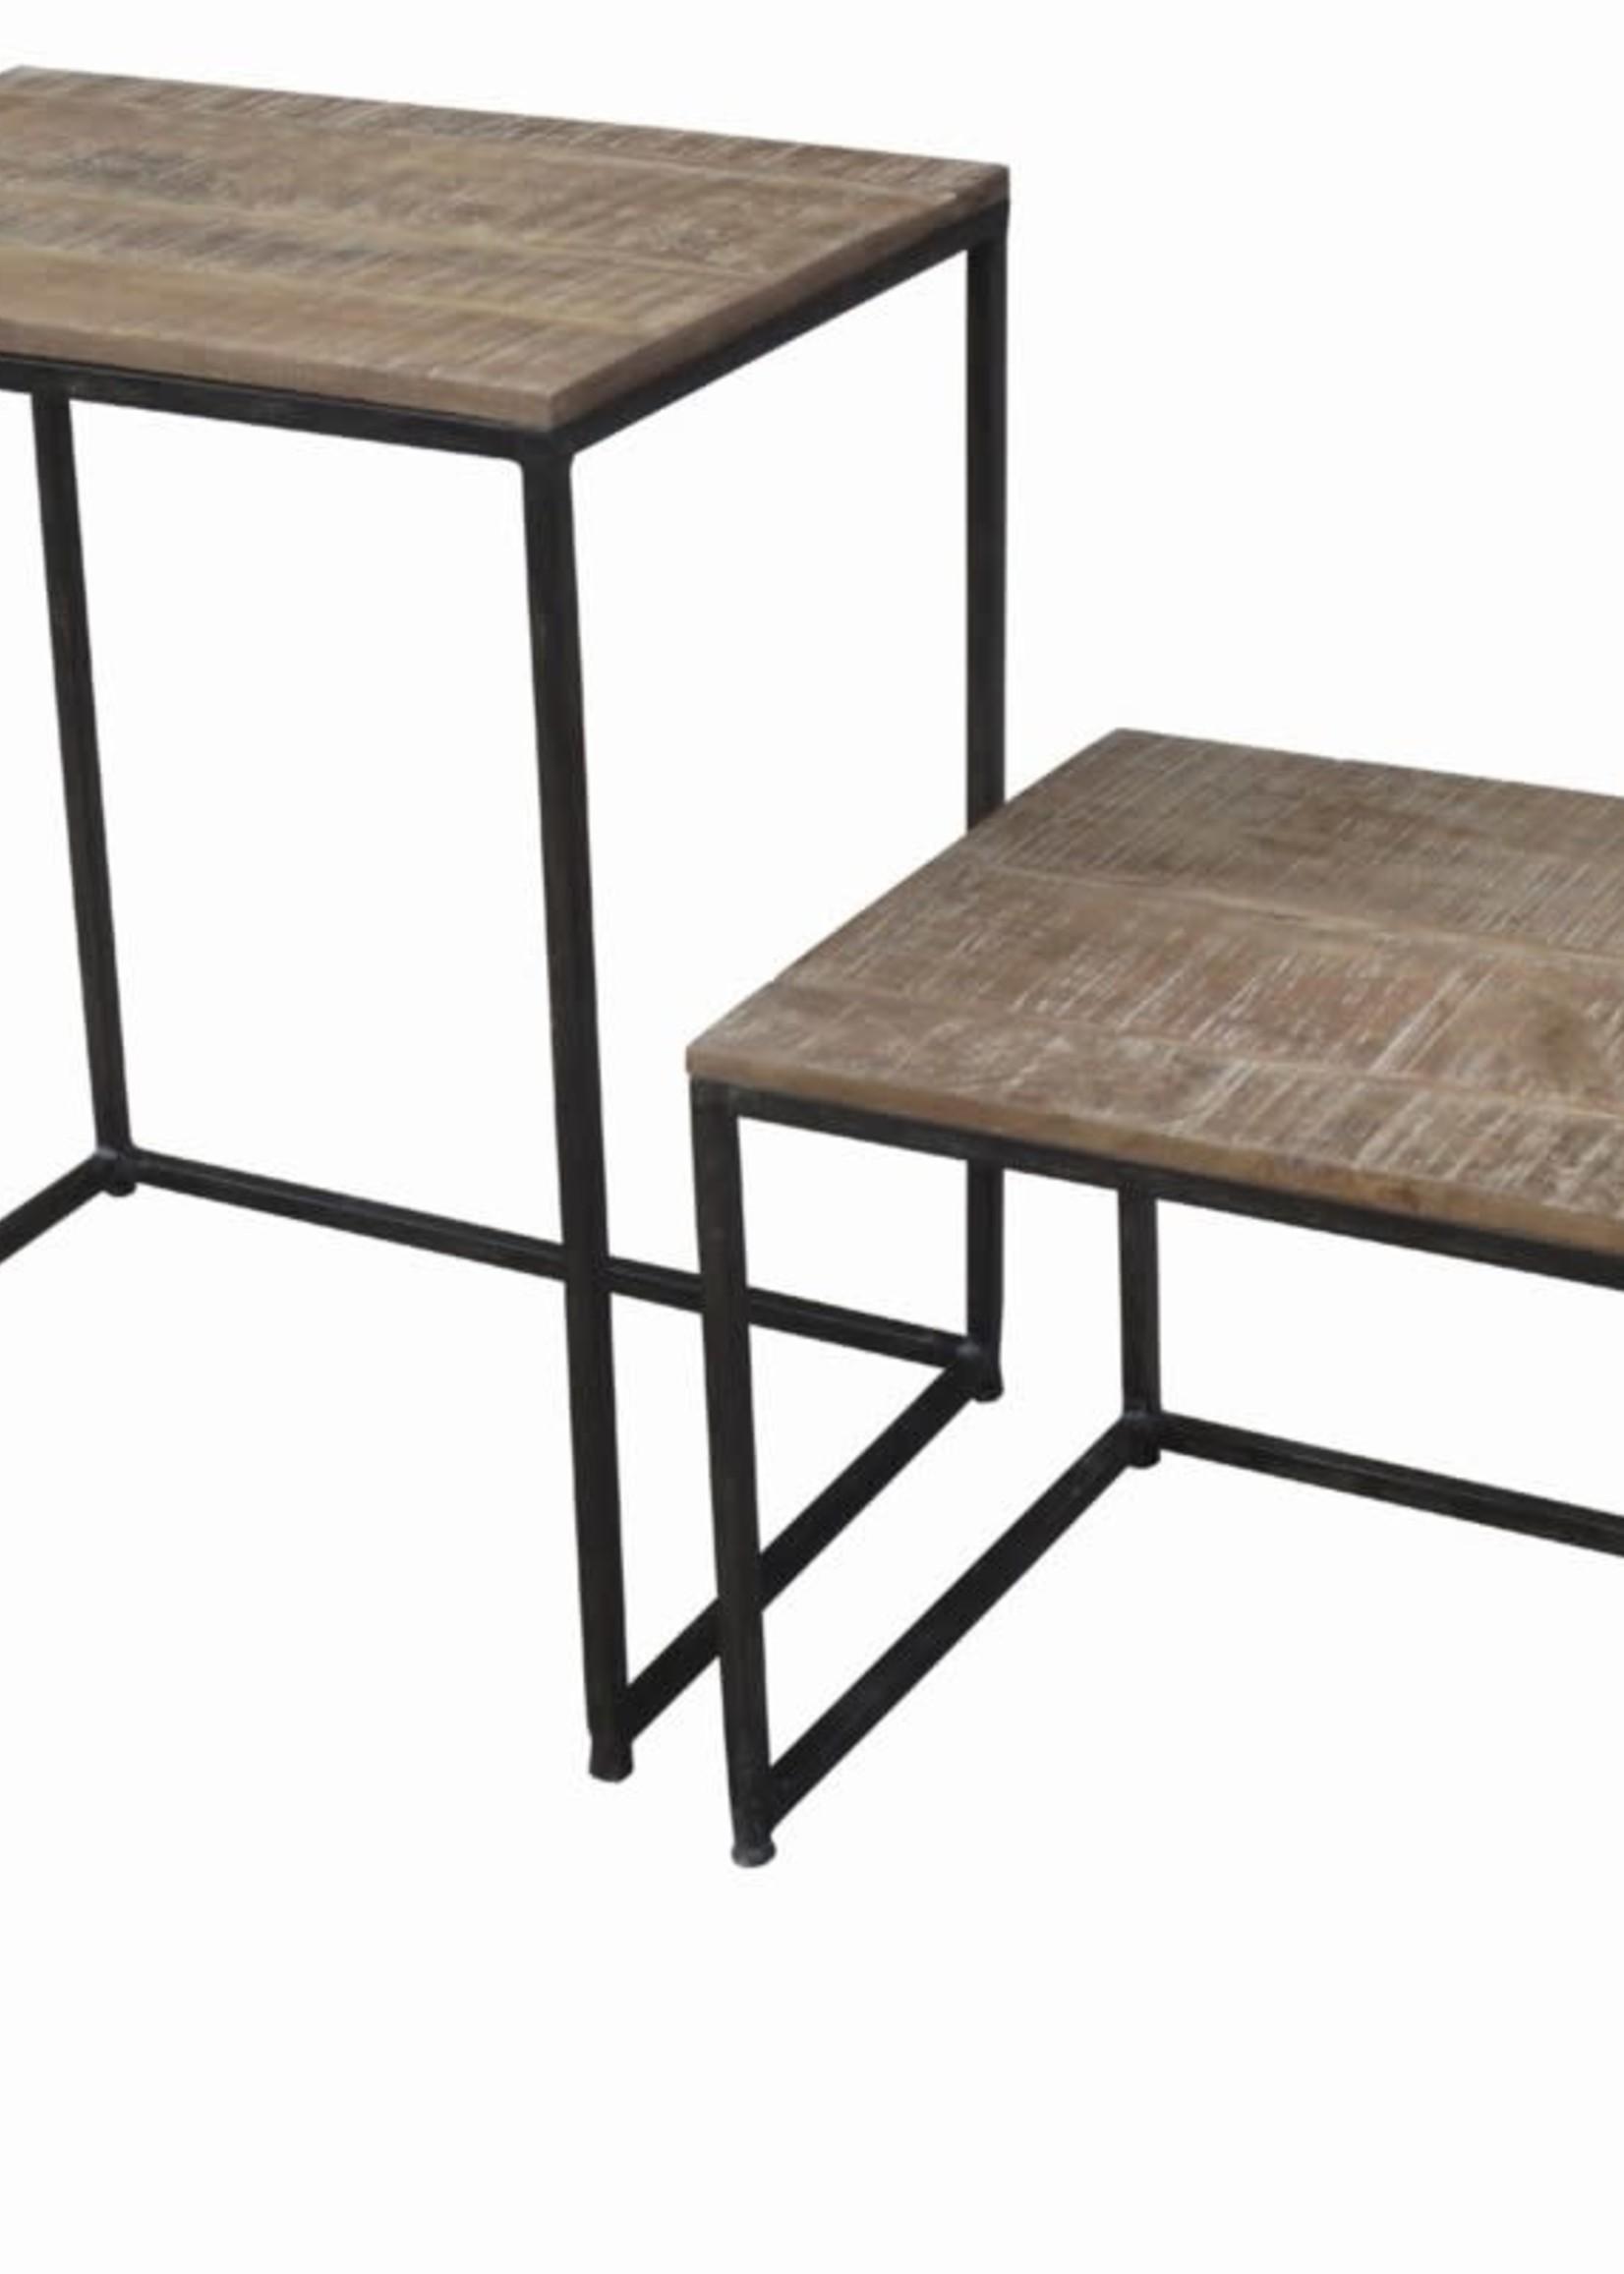 Lana Nesting Table - Set of 2